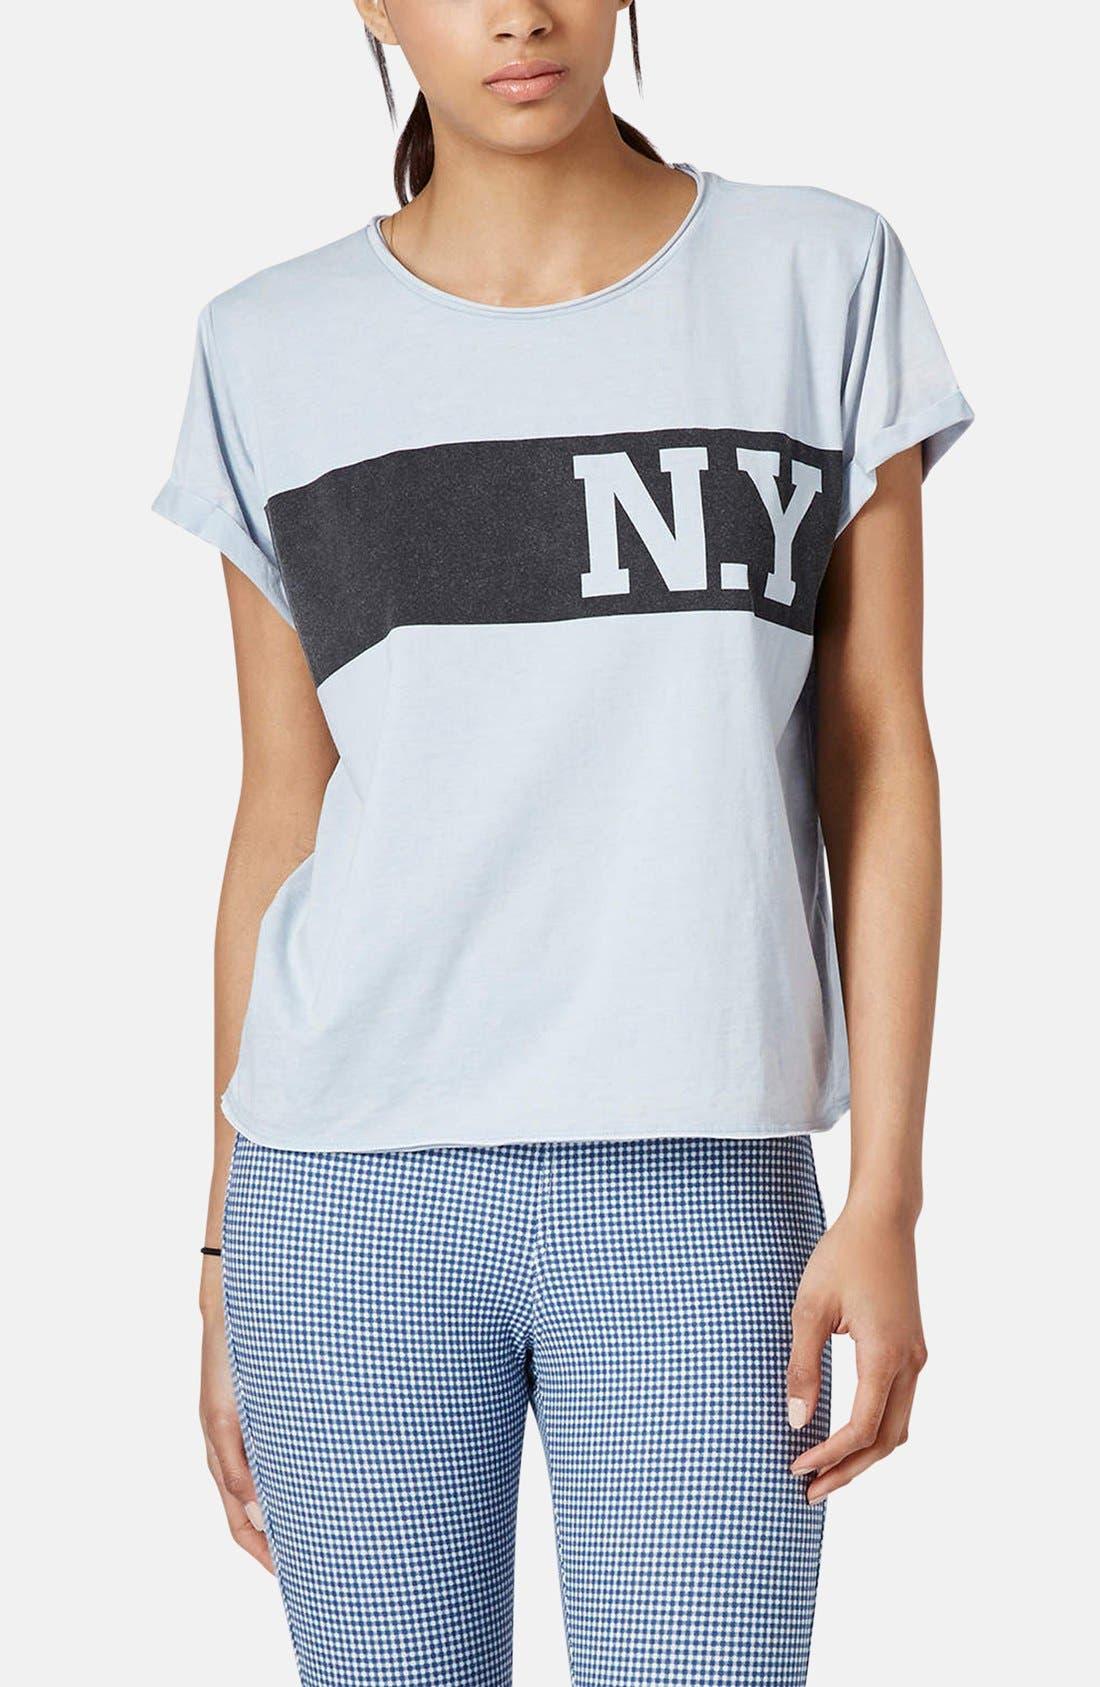 Alternate Image 1 Selected - Topshop 'New York' Graphic Tee (Petite)